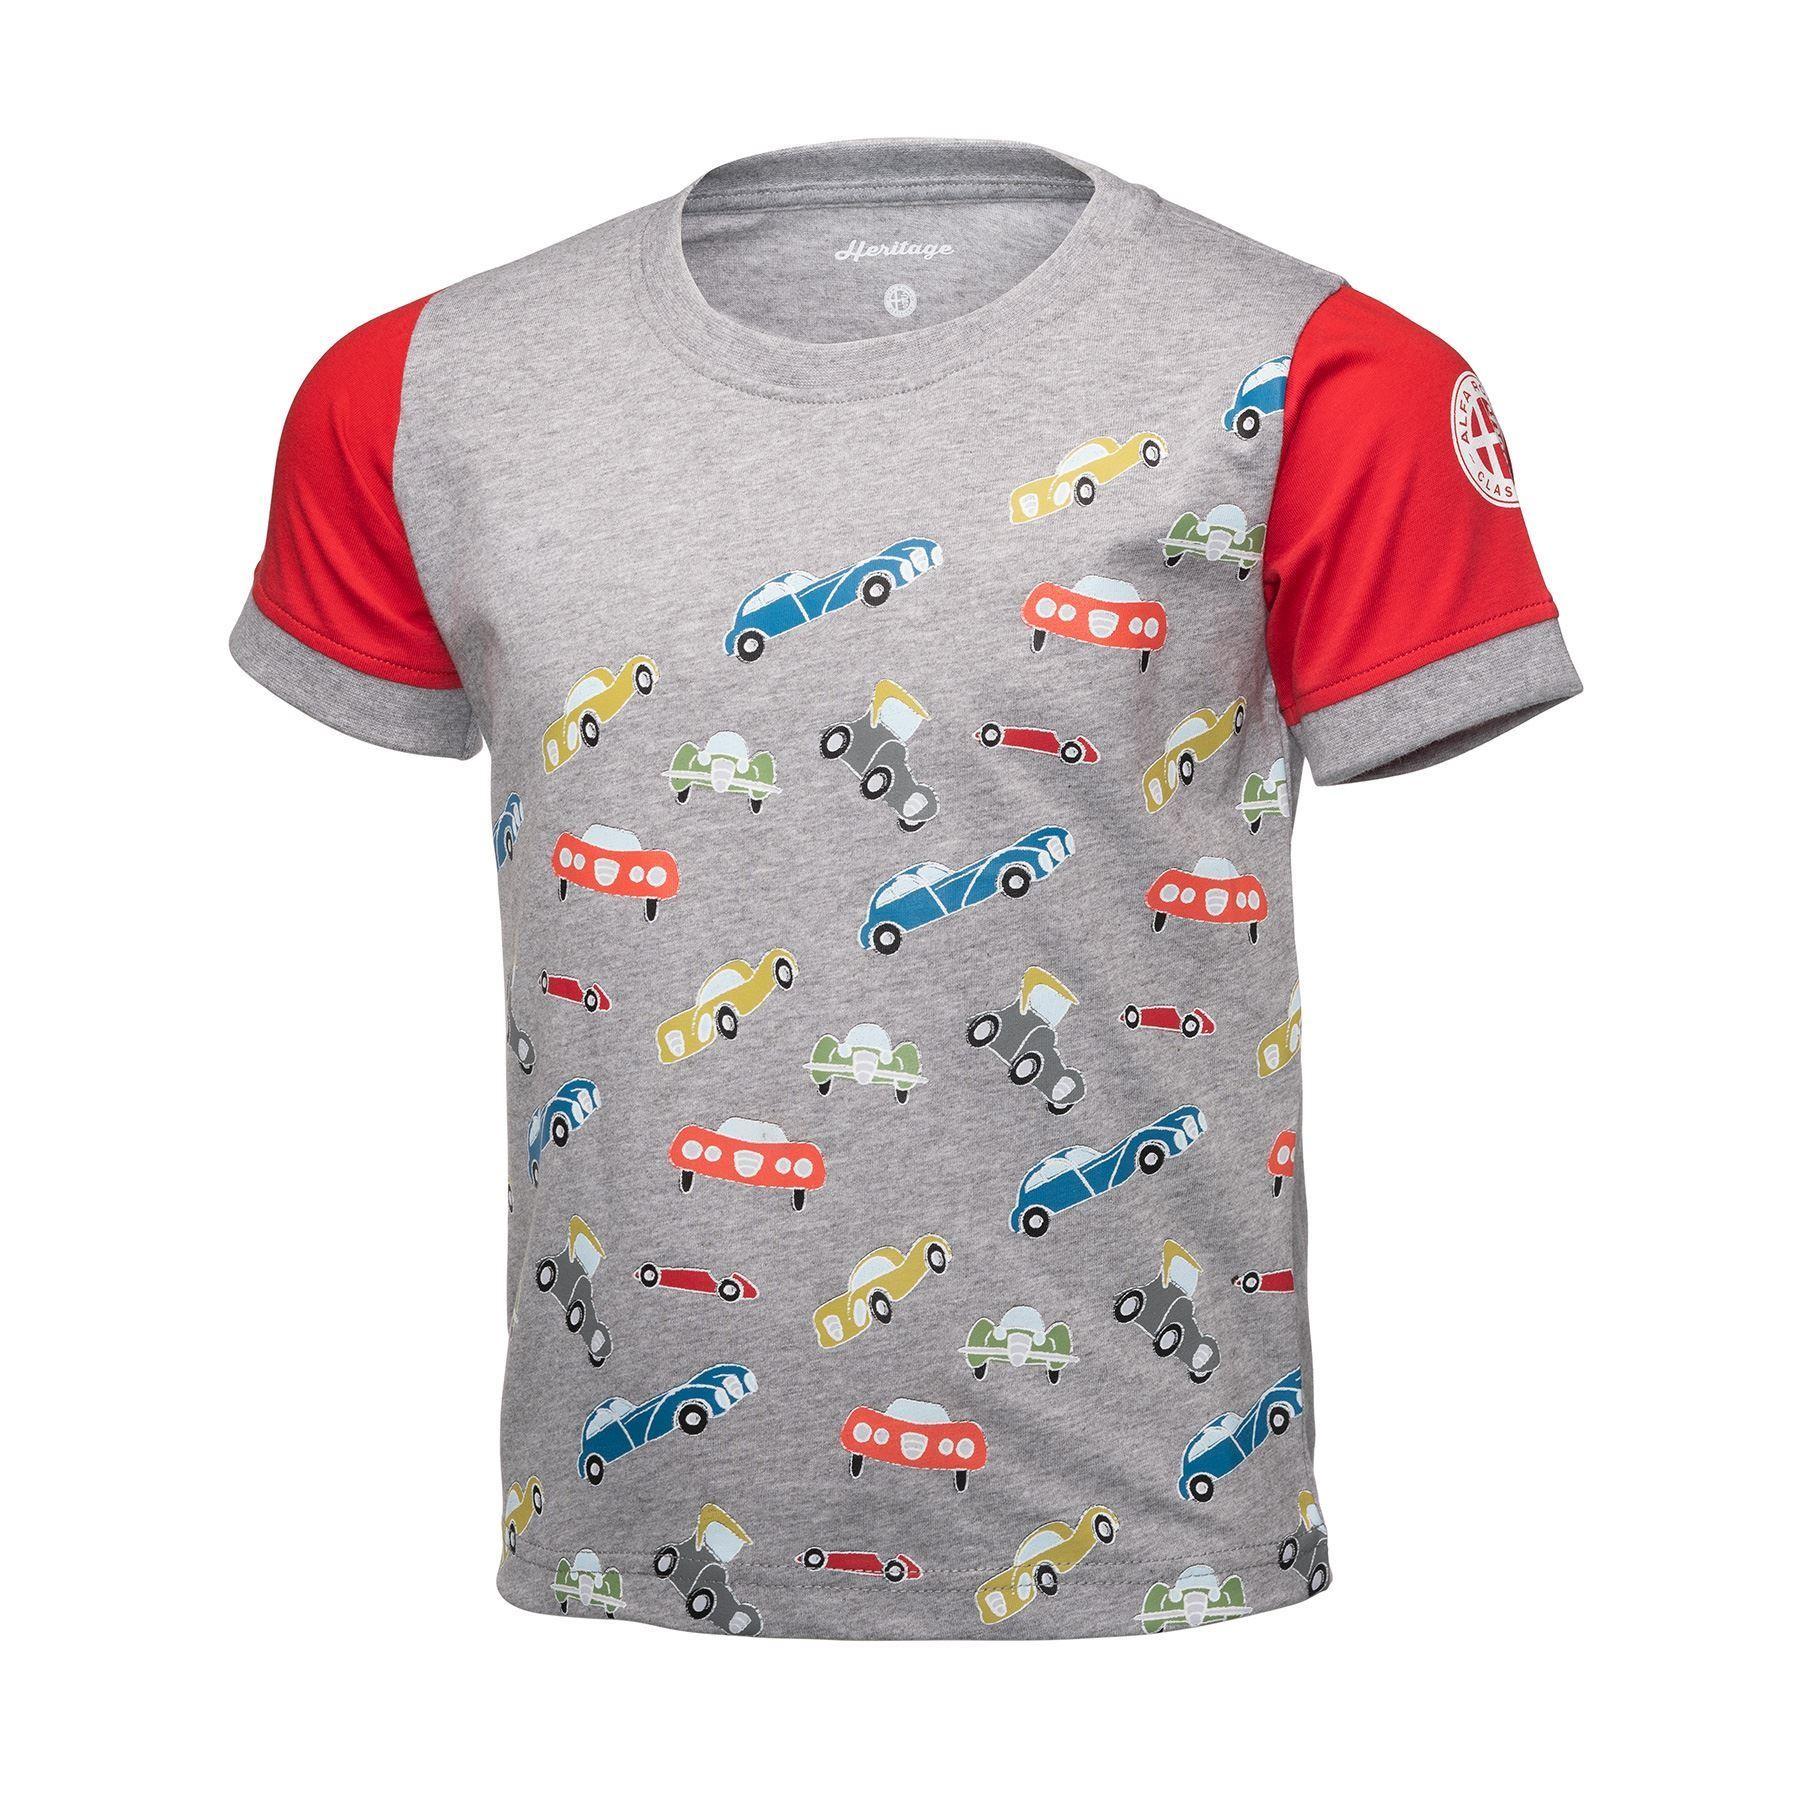 Heritage Kids/Children T-Shirt - Size 1-2 Years